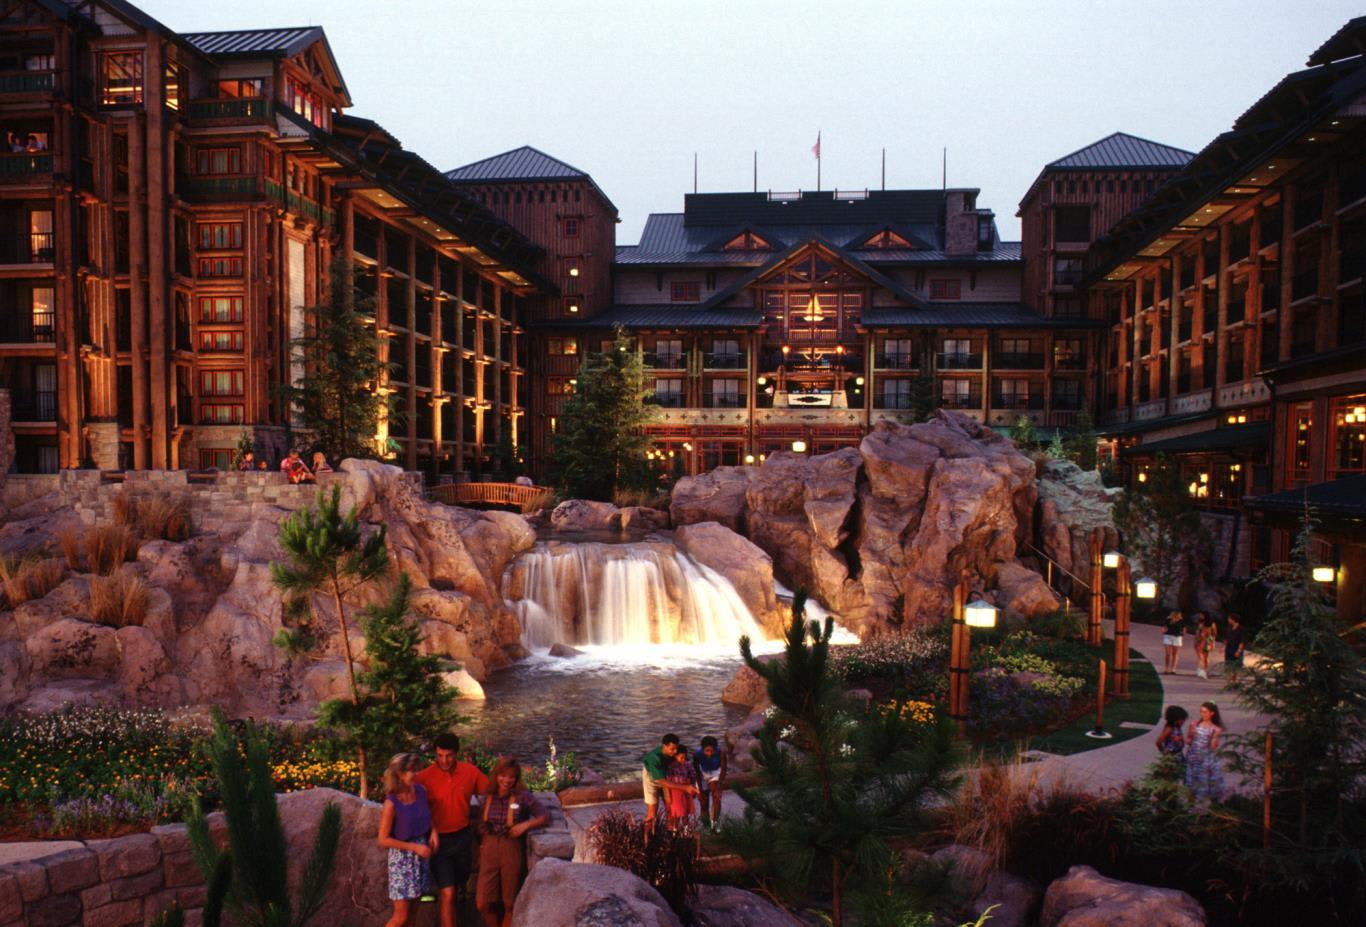 Villas at Disneys Wilderness Lodge